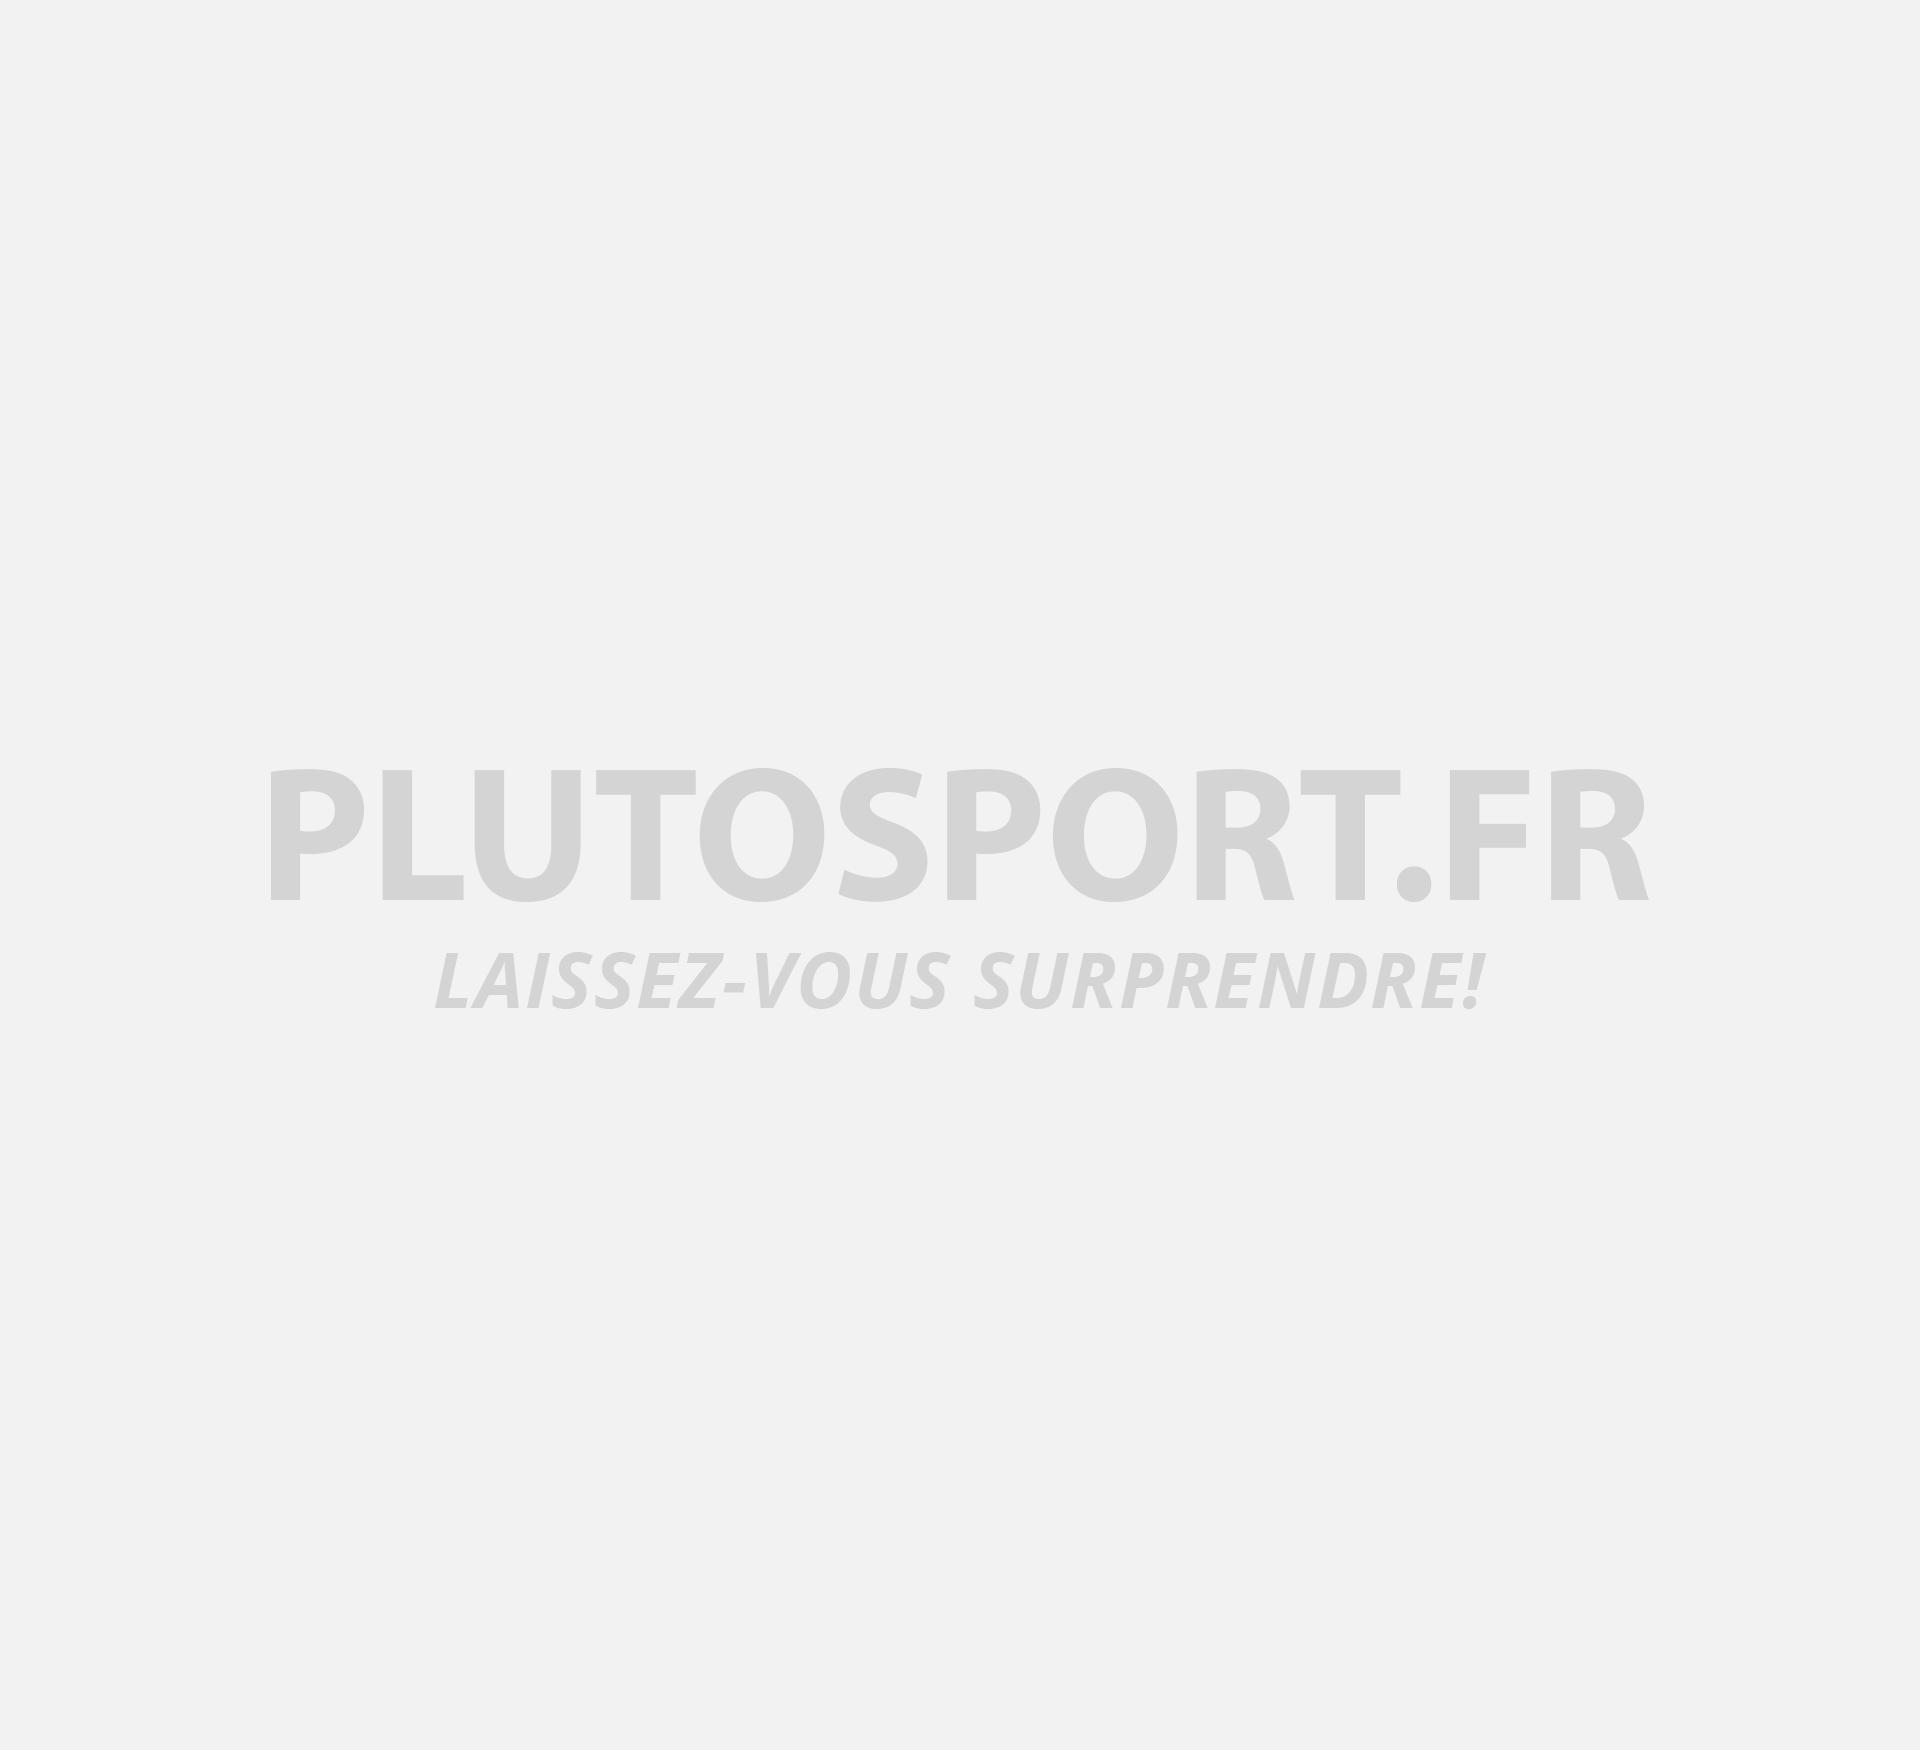 De Neo 2Chaussure Gel Asics Hockey LUqjMpGSzV